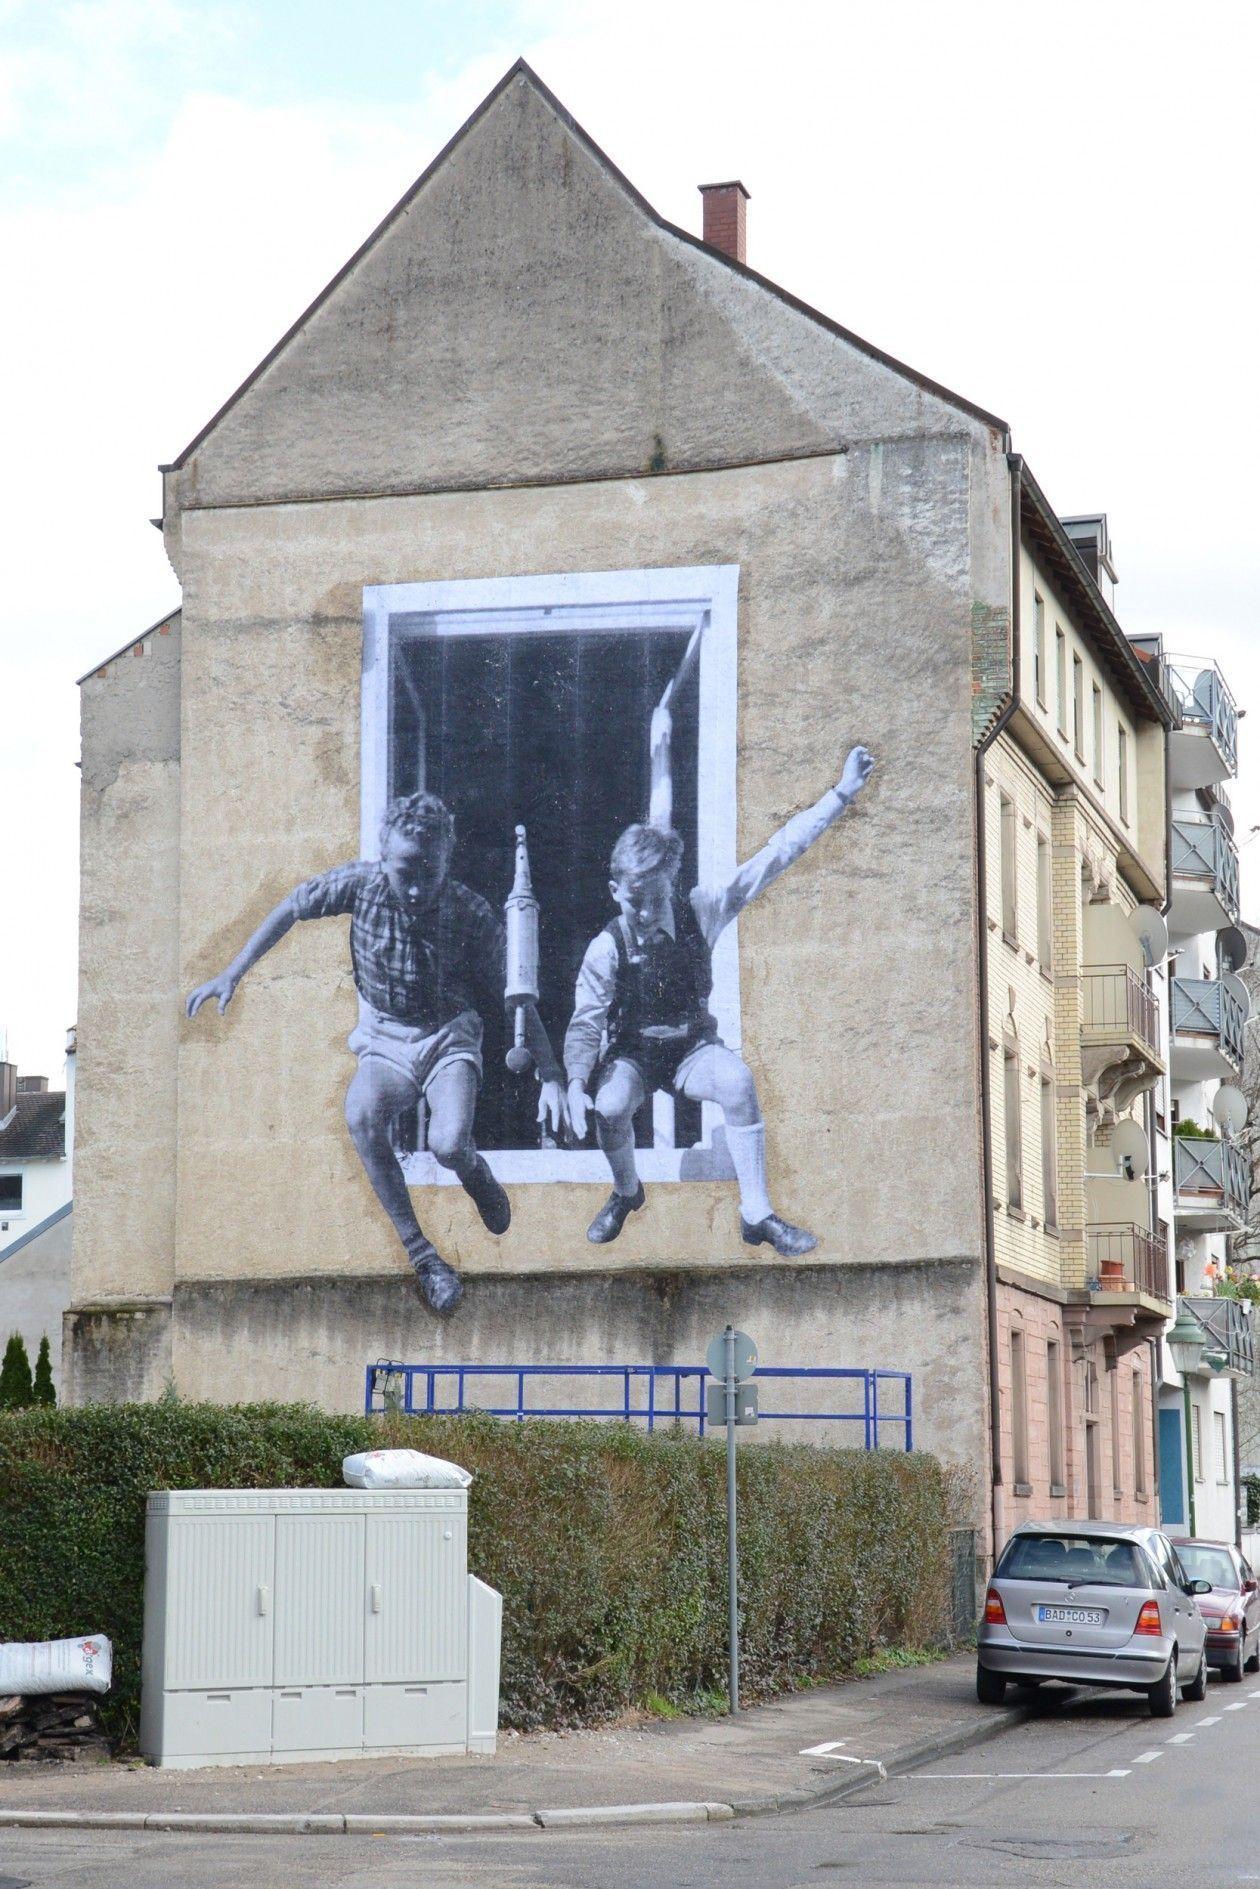 French artist JR … … Art Sidewalk, Street, Sand, etc